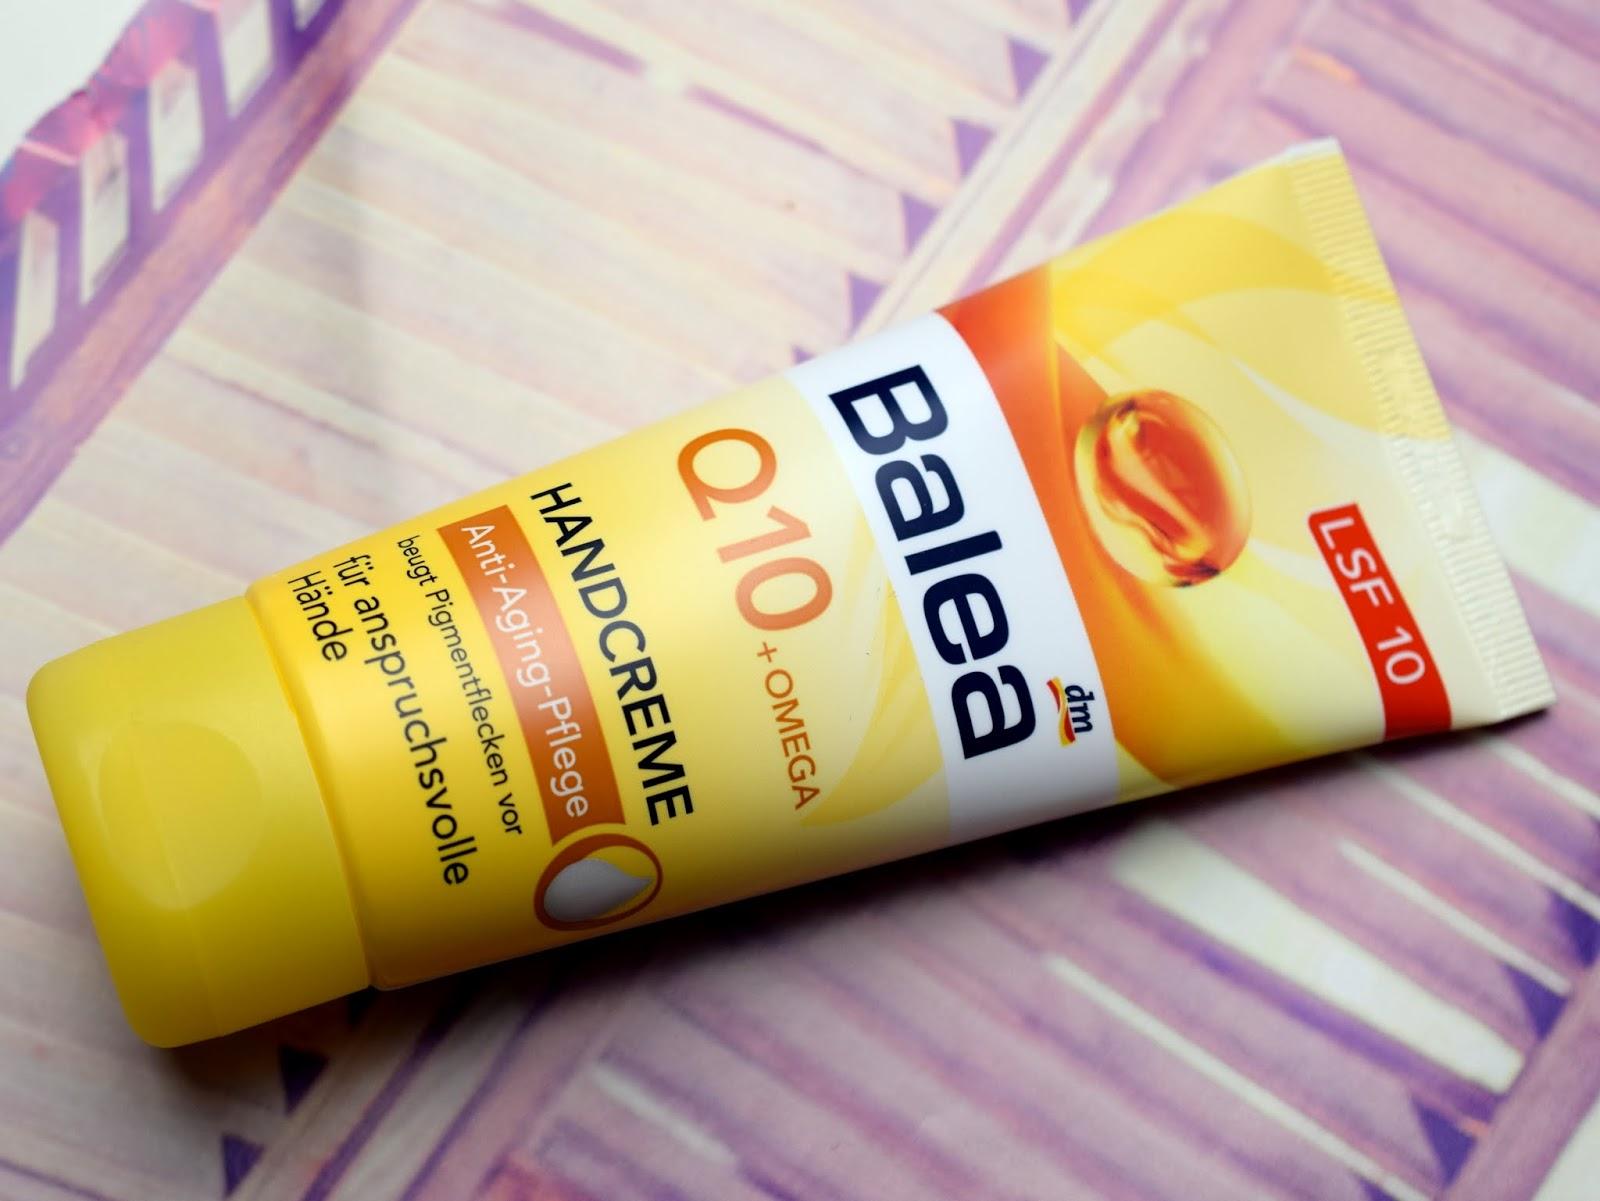 Balea Q10 + Omega Handcreme Anti-Aging Pflege